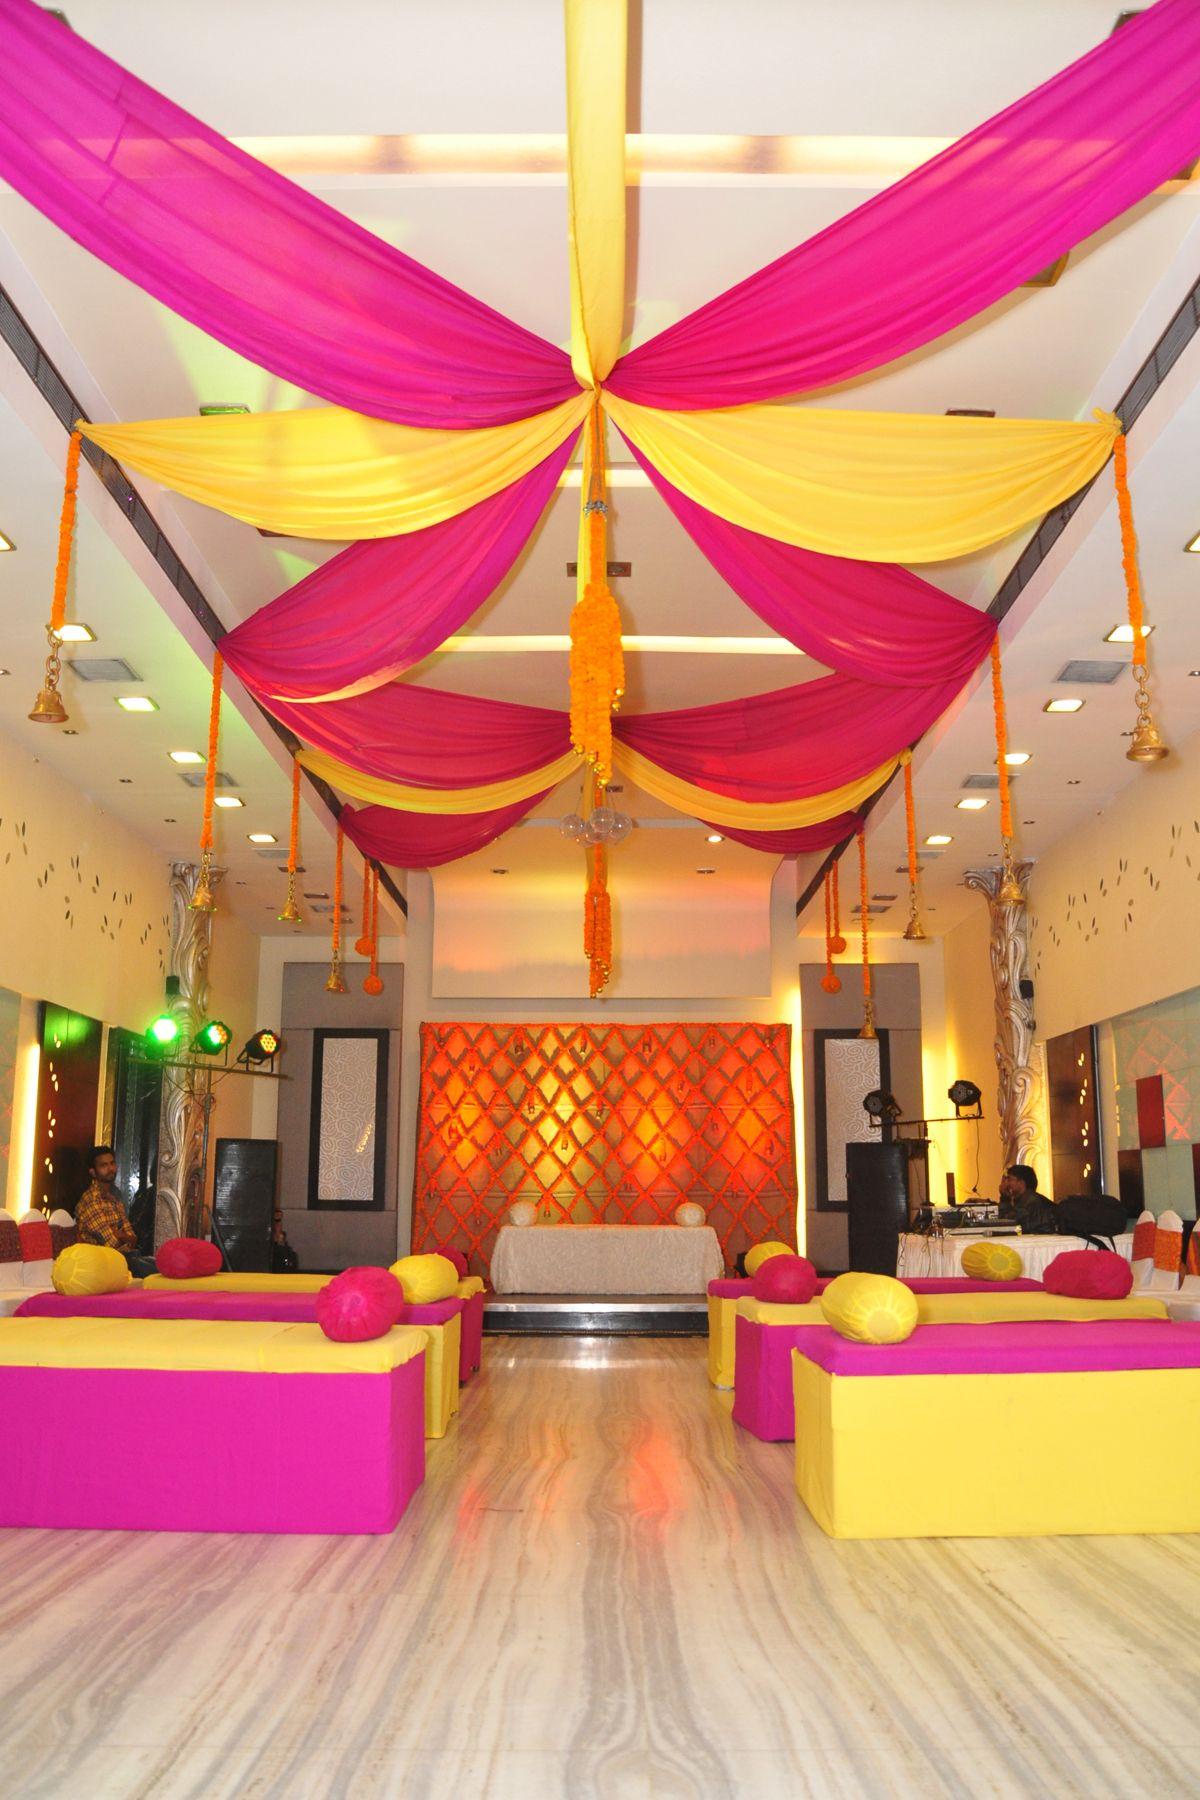 Ceiling drapes   Wedding decorations, Home decor, Drapes